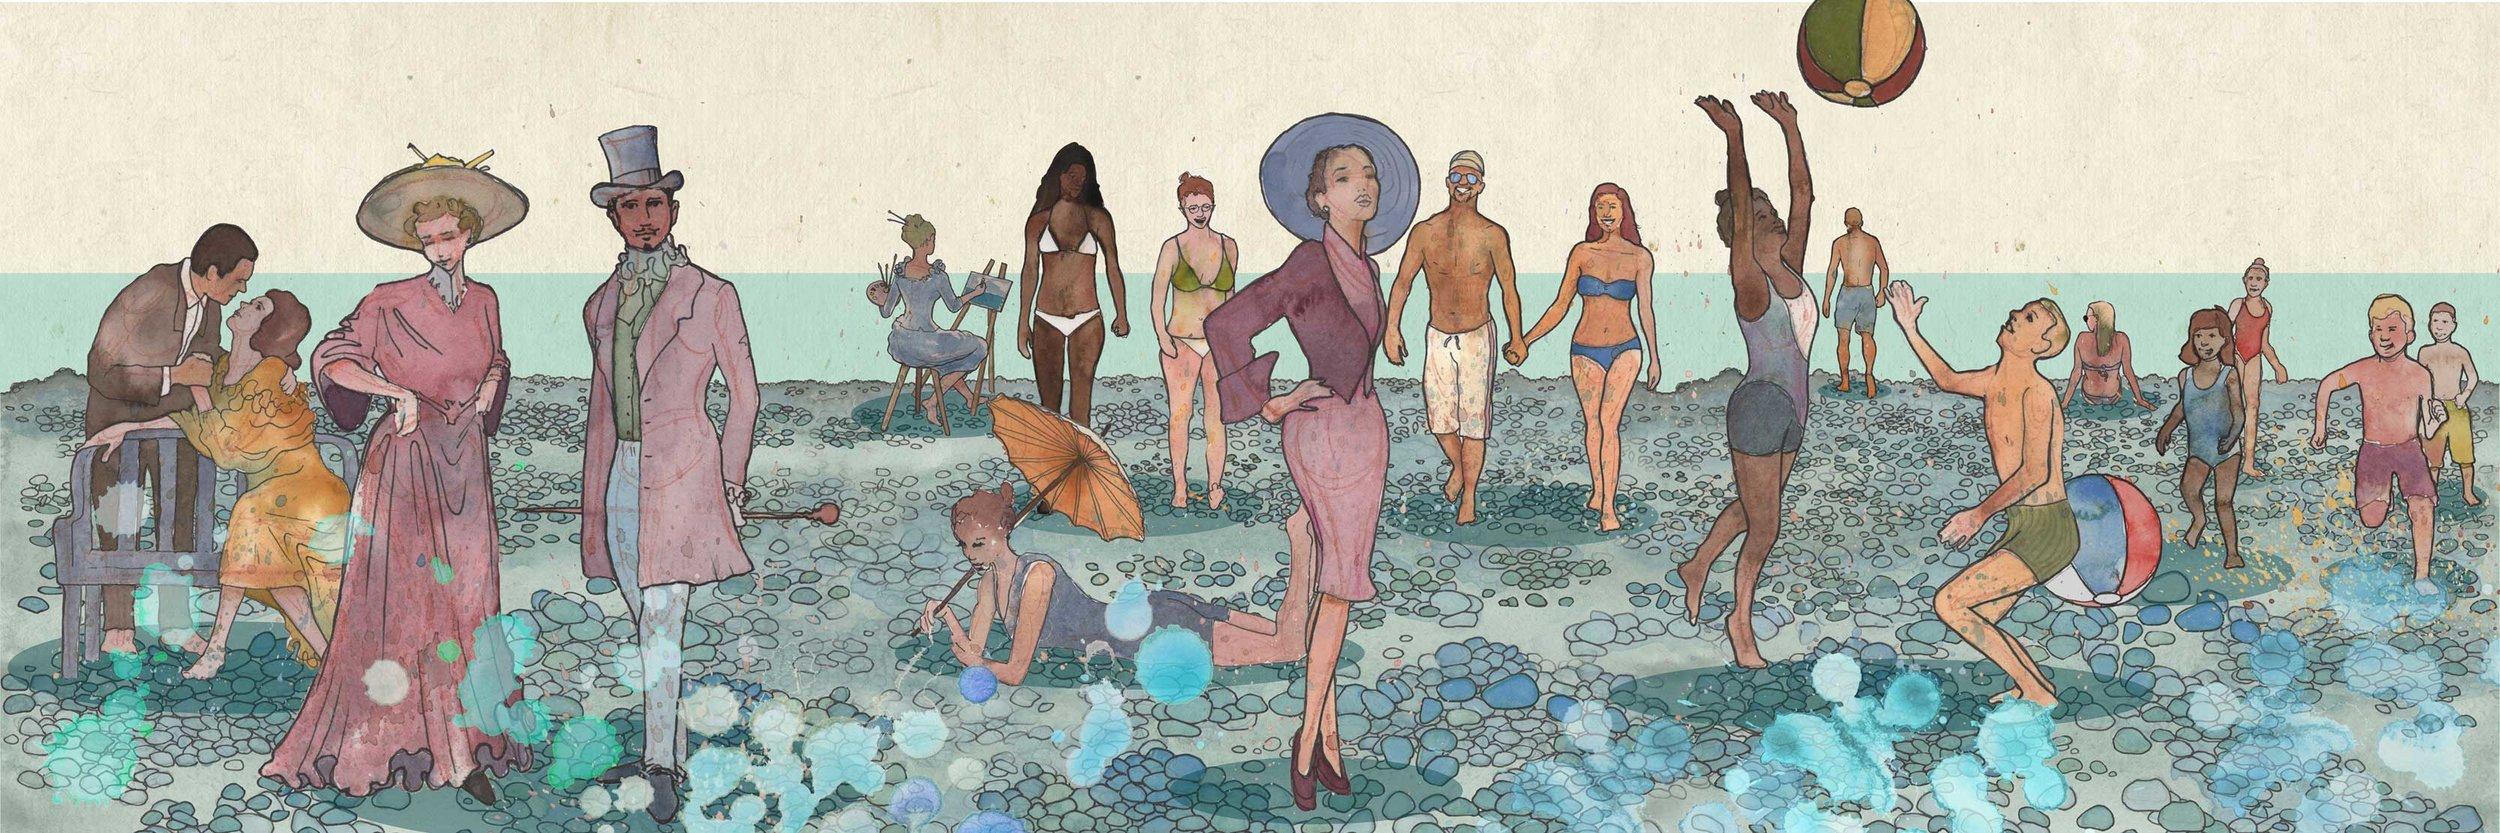 Lido-Plage-watercolor-artwork-by-Ronny-Bergfeldt.jpg